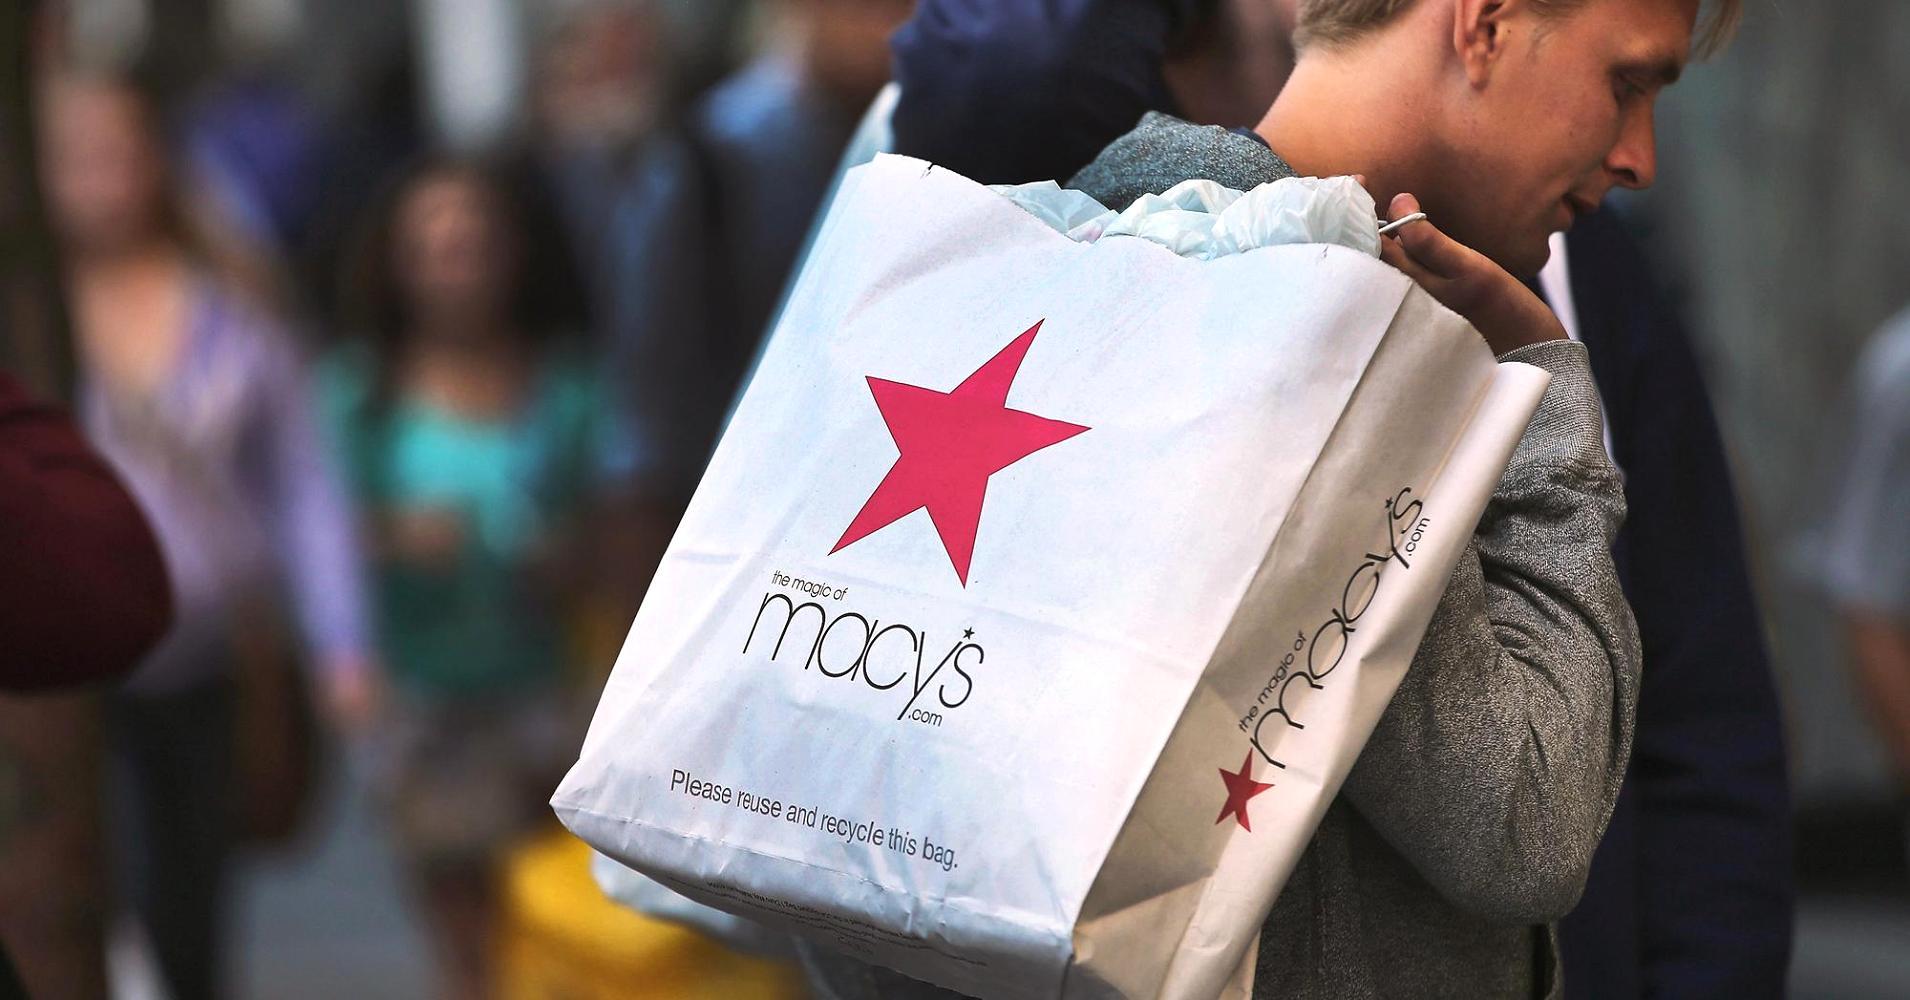 macys compra - Macy's contrata a ex ejecutiva de eBay para potenciar su plataforma digital